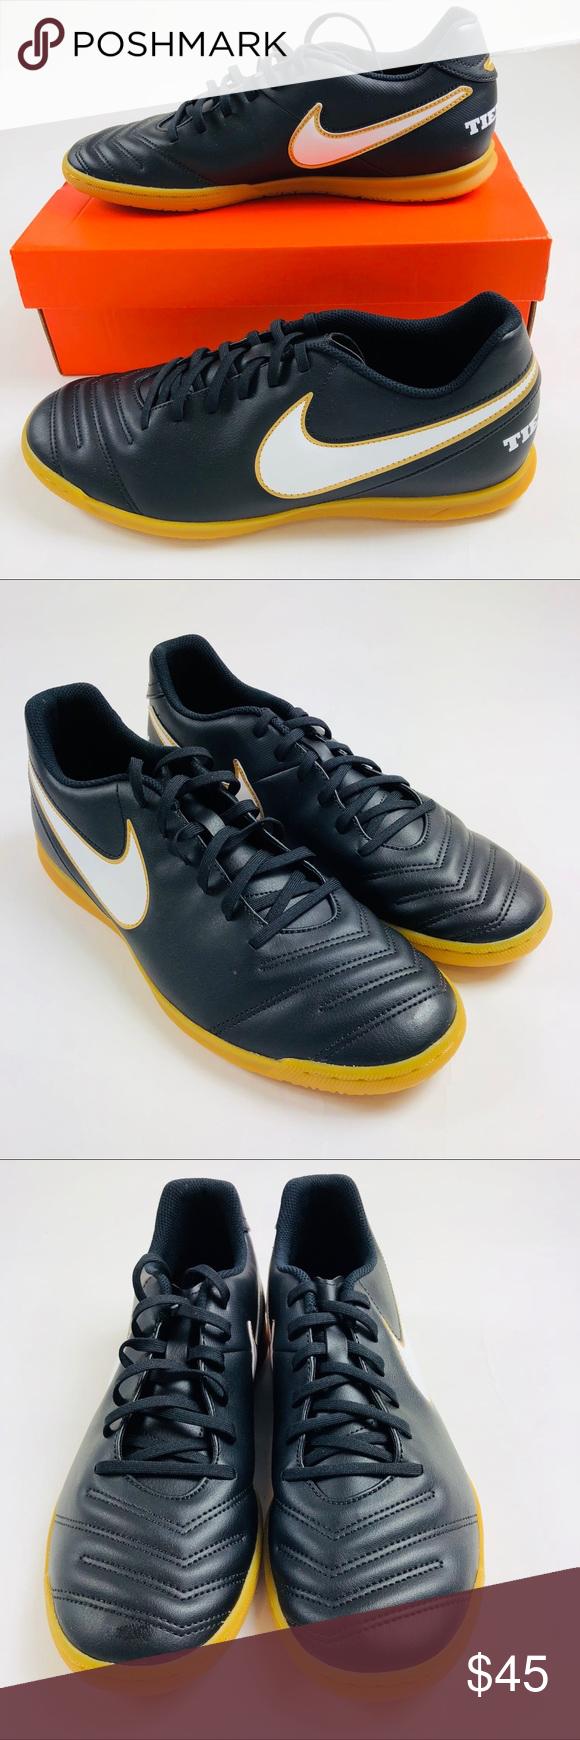 42b8f628a11 Nike Tiempo Rio III IC Indoor Soccer Shoes Black Nike Tiempo Rio III IC  Indoor Soccer Shoes Black Gold 819234 010 Mens. Size 11